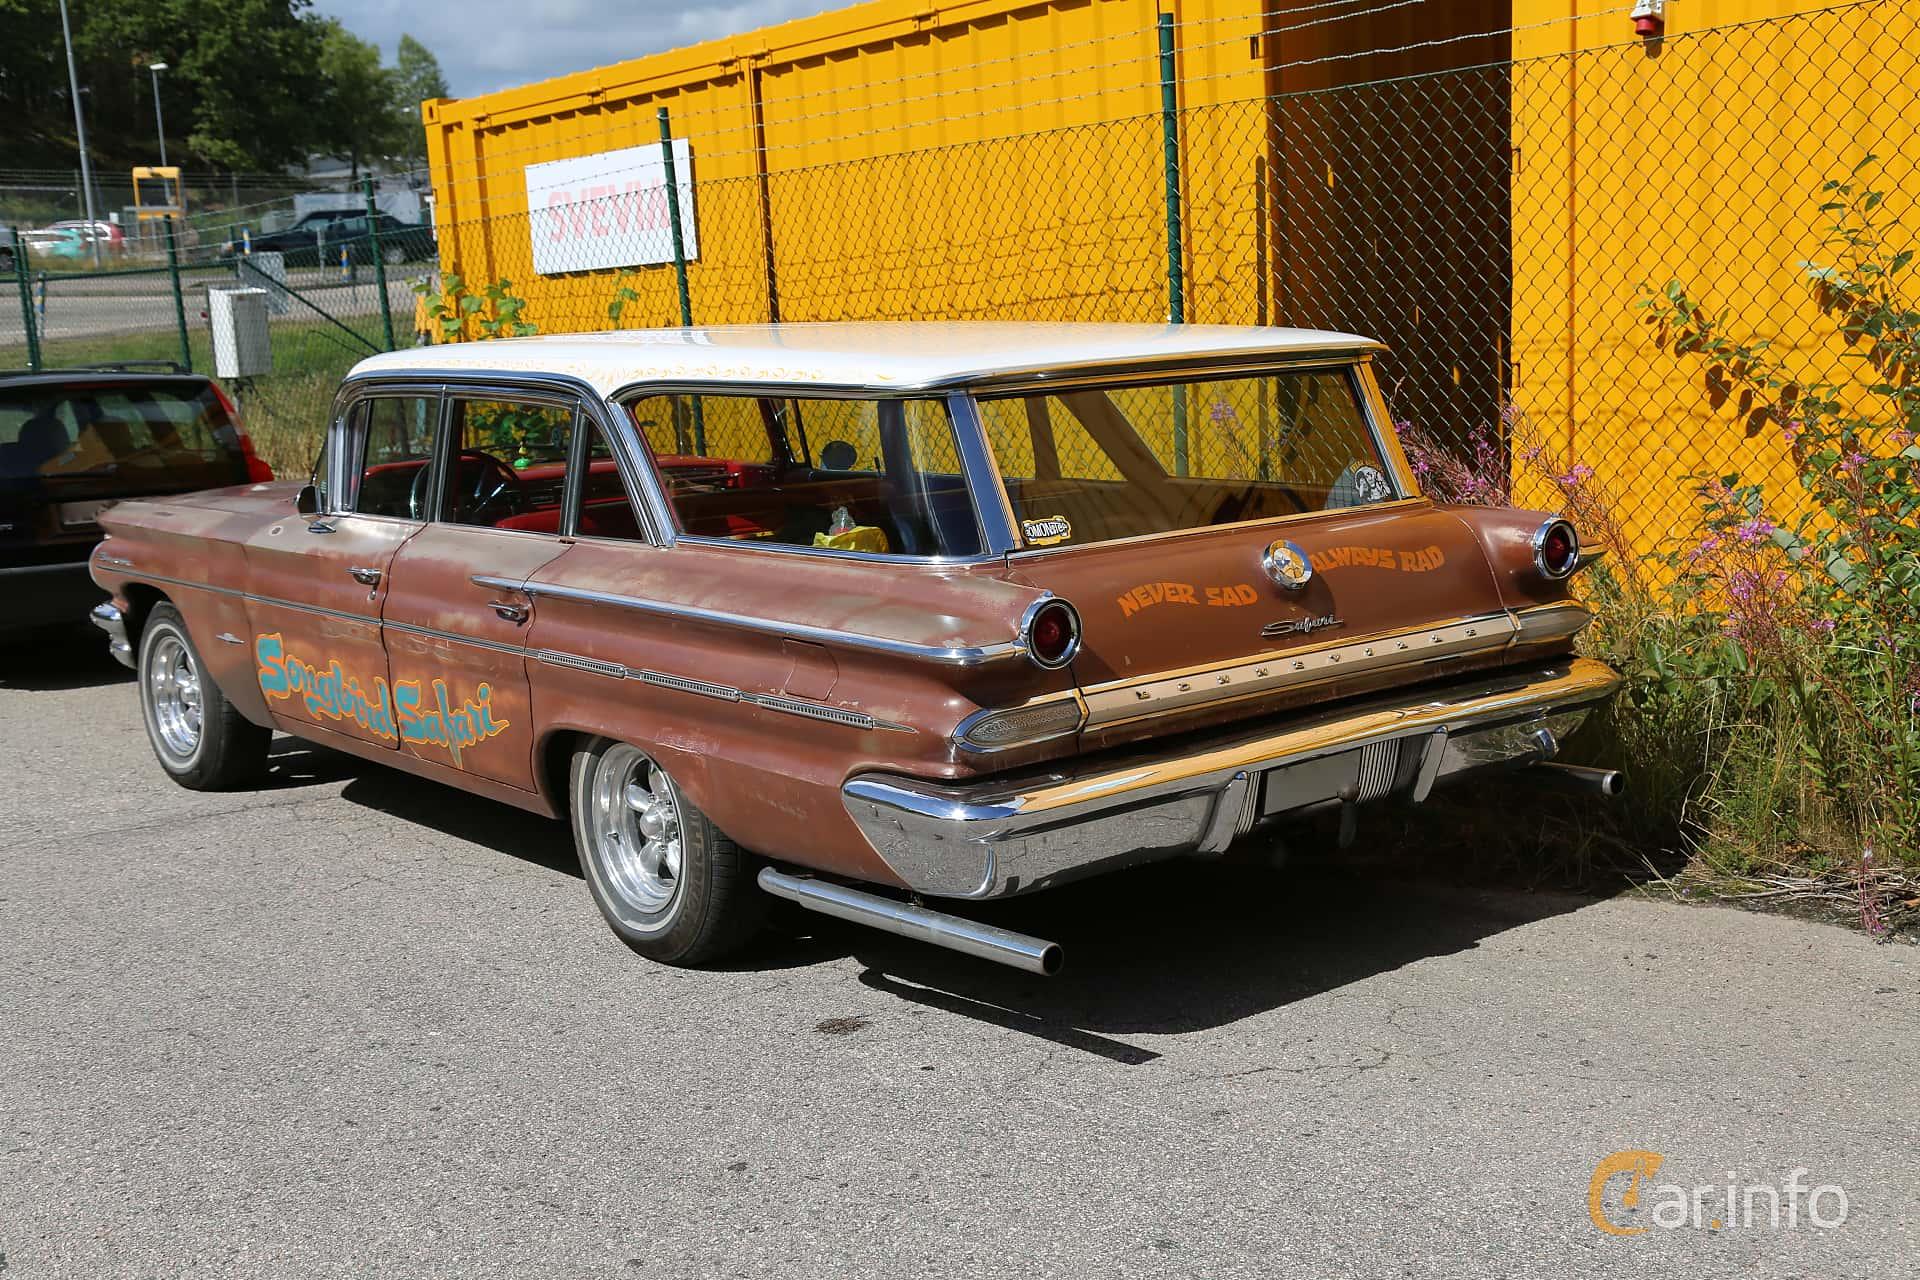 2 Images Of Pontiac Bonneville Station Wagon 64 V8 Automatic 305hp 1960 Back Side 305ps